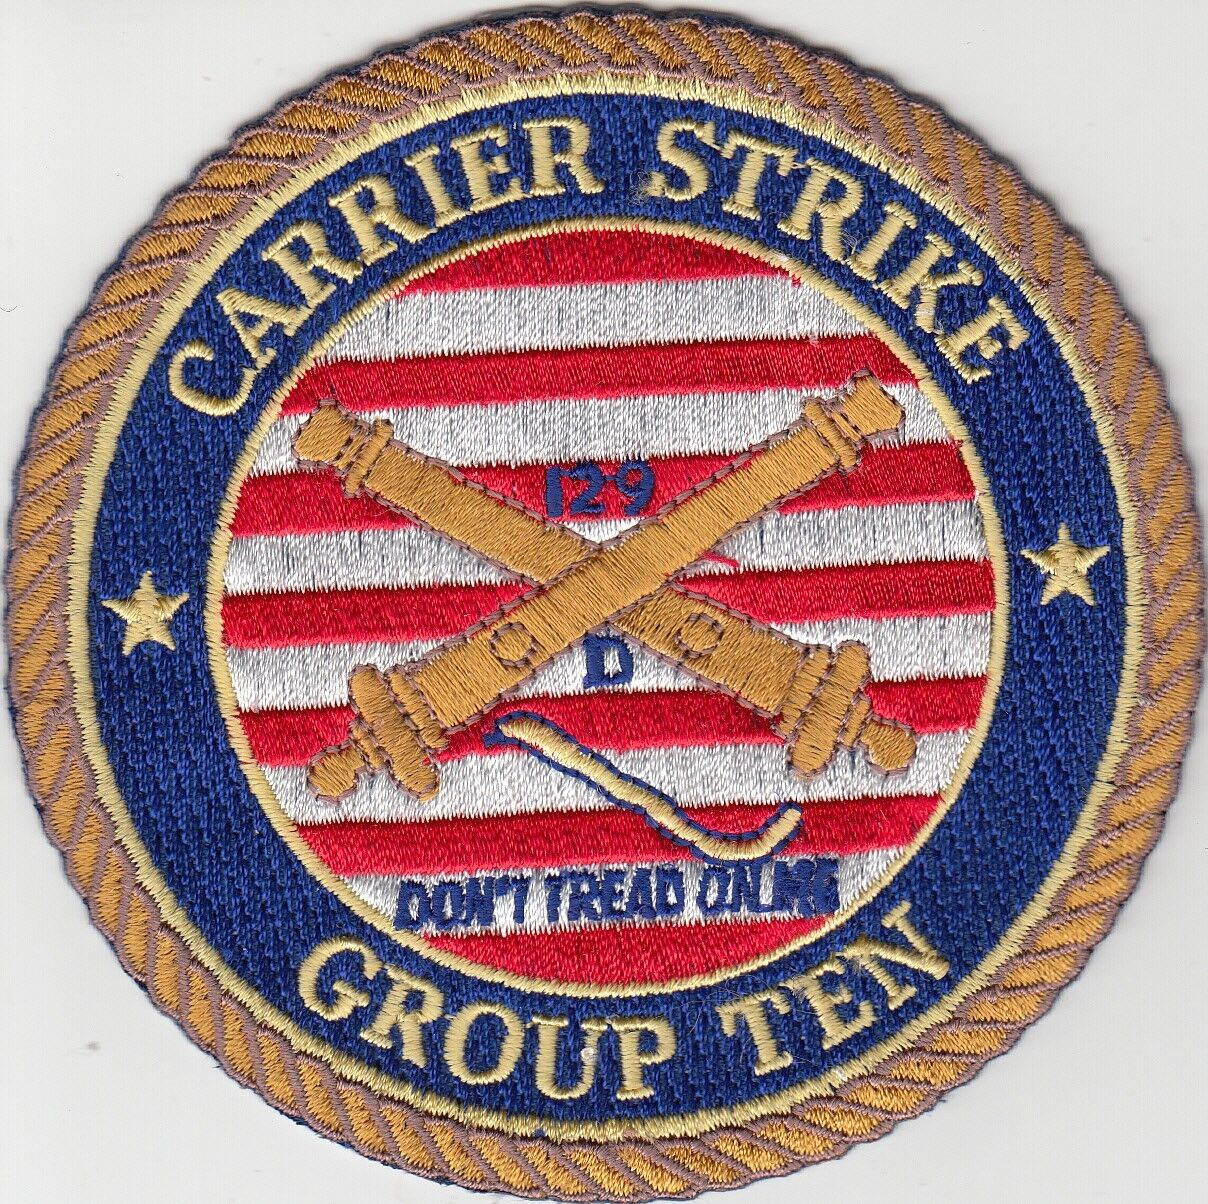 Carrier Strike Group Ten 96